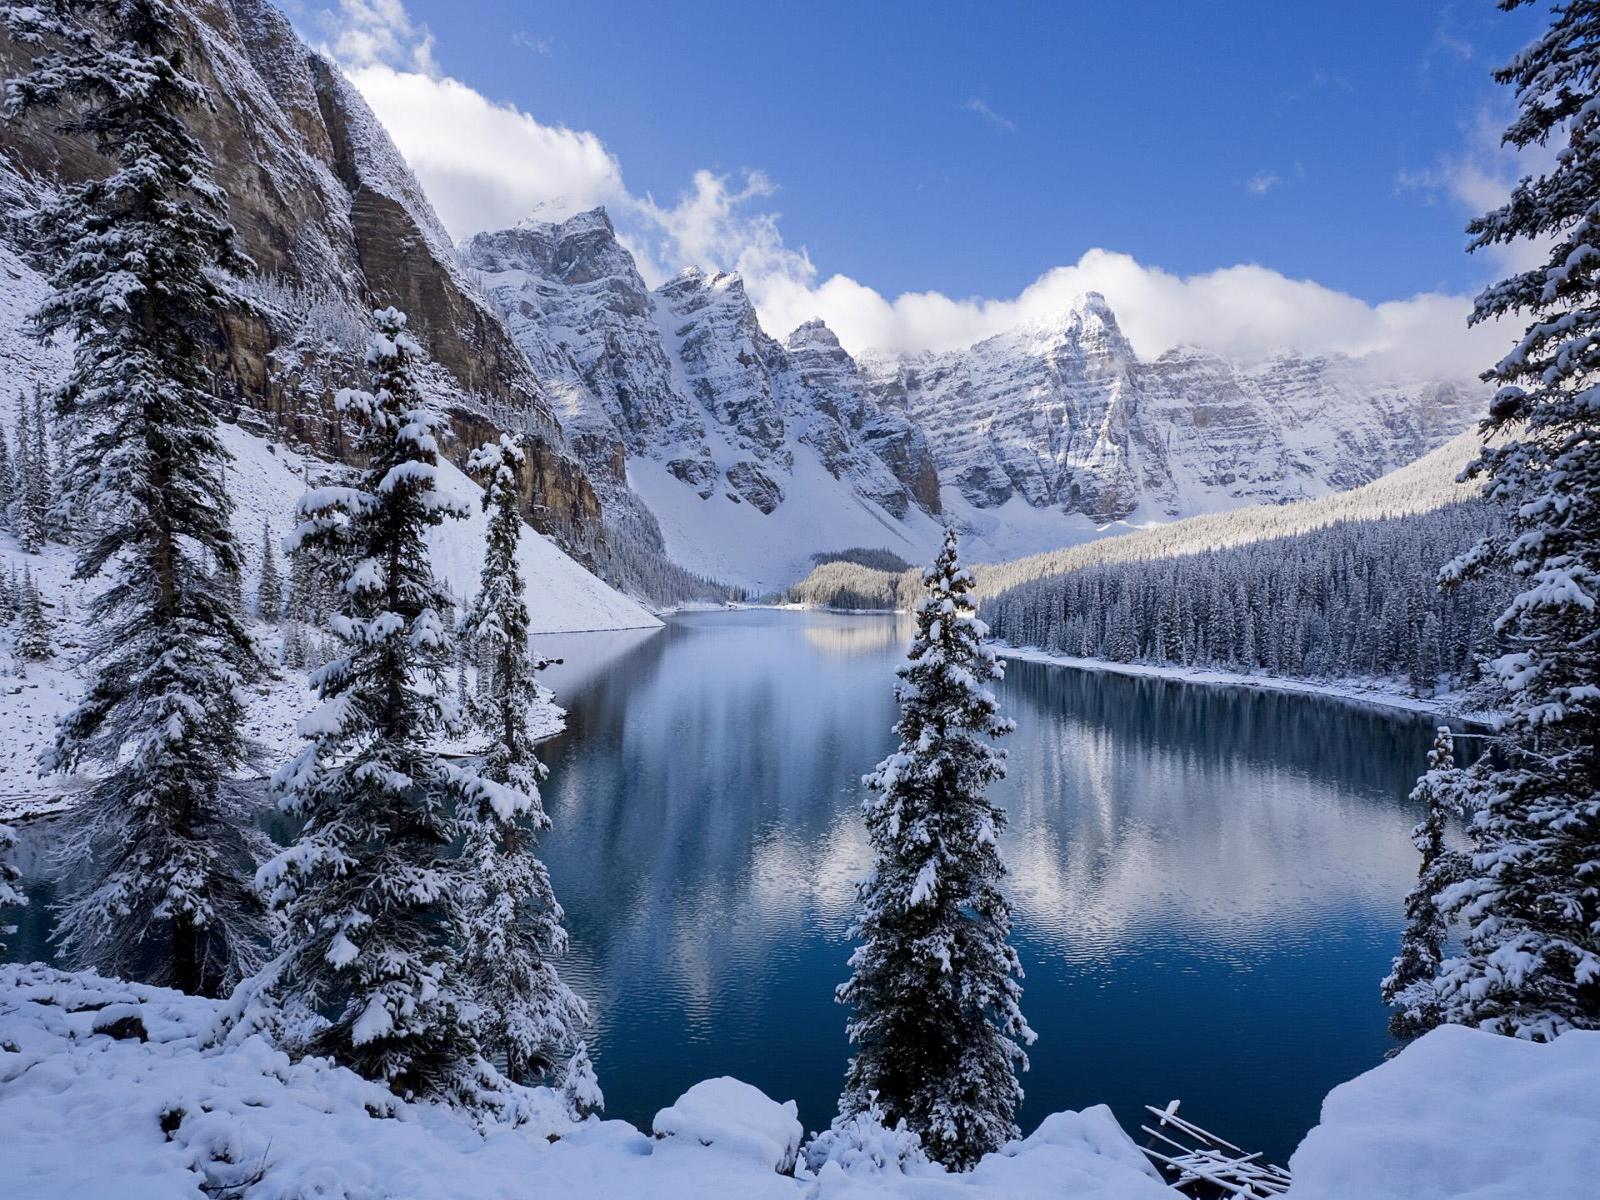 Winter Snow Desktop Wallpaper 1600x1200